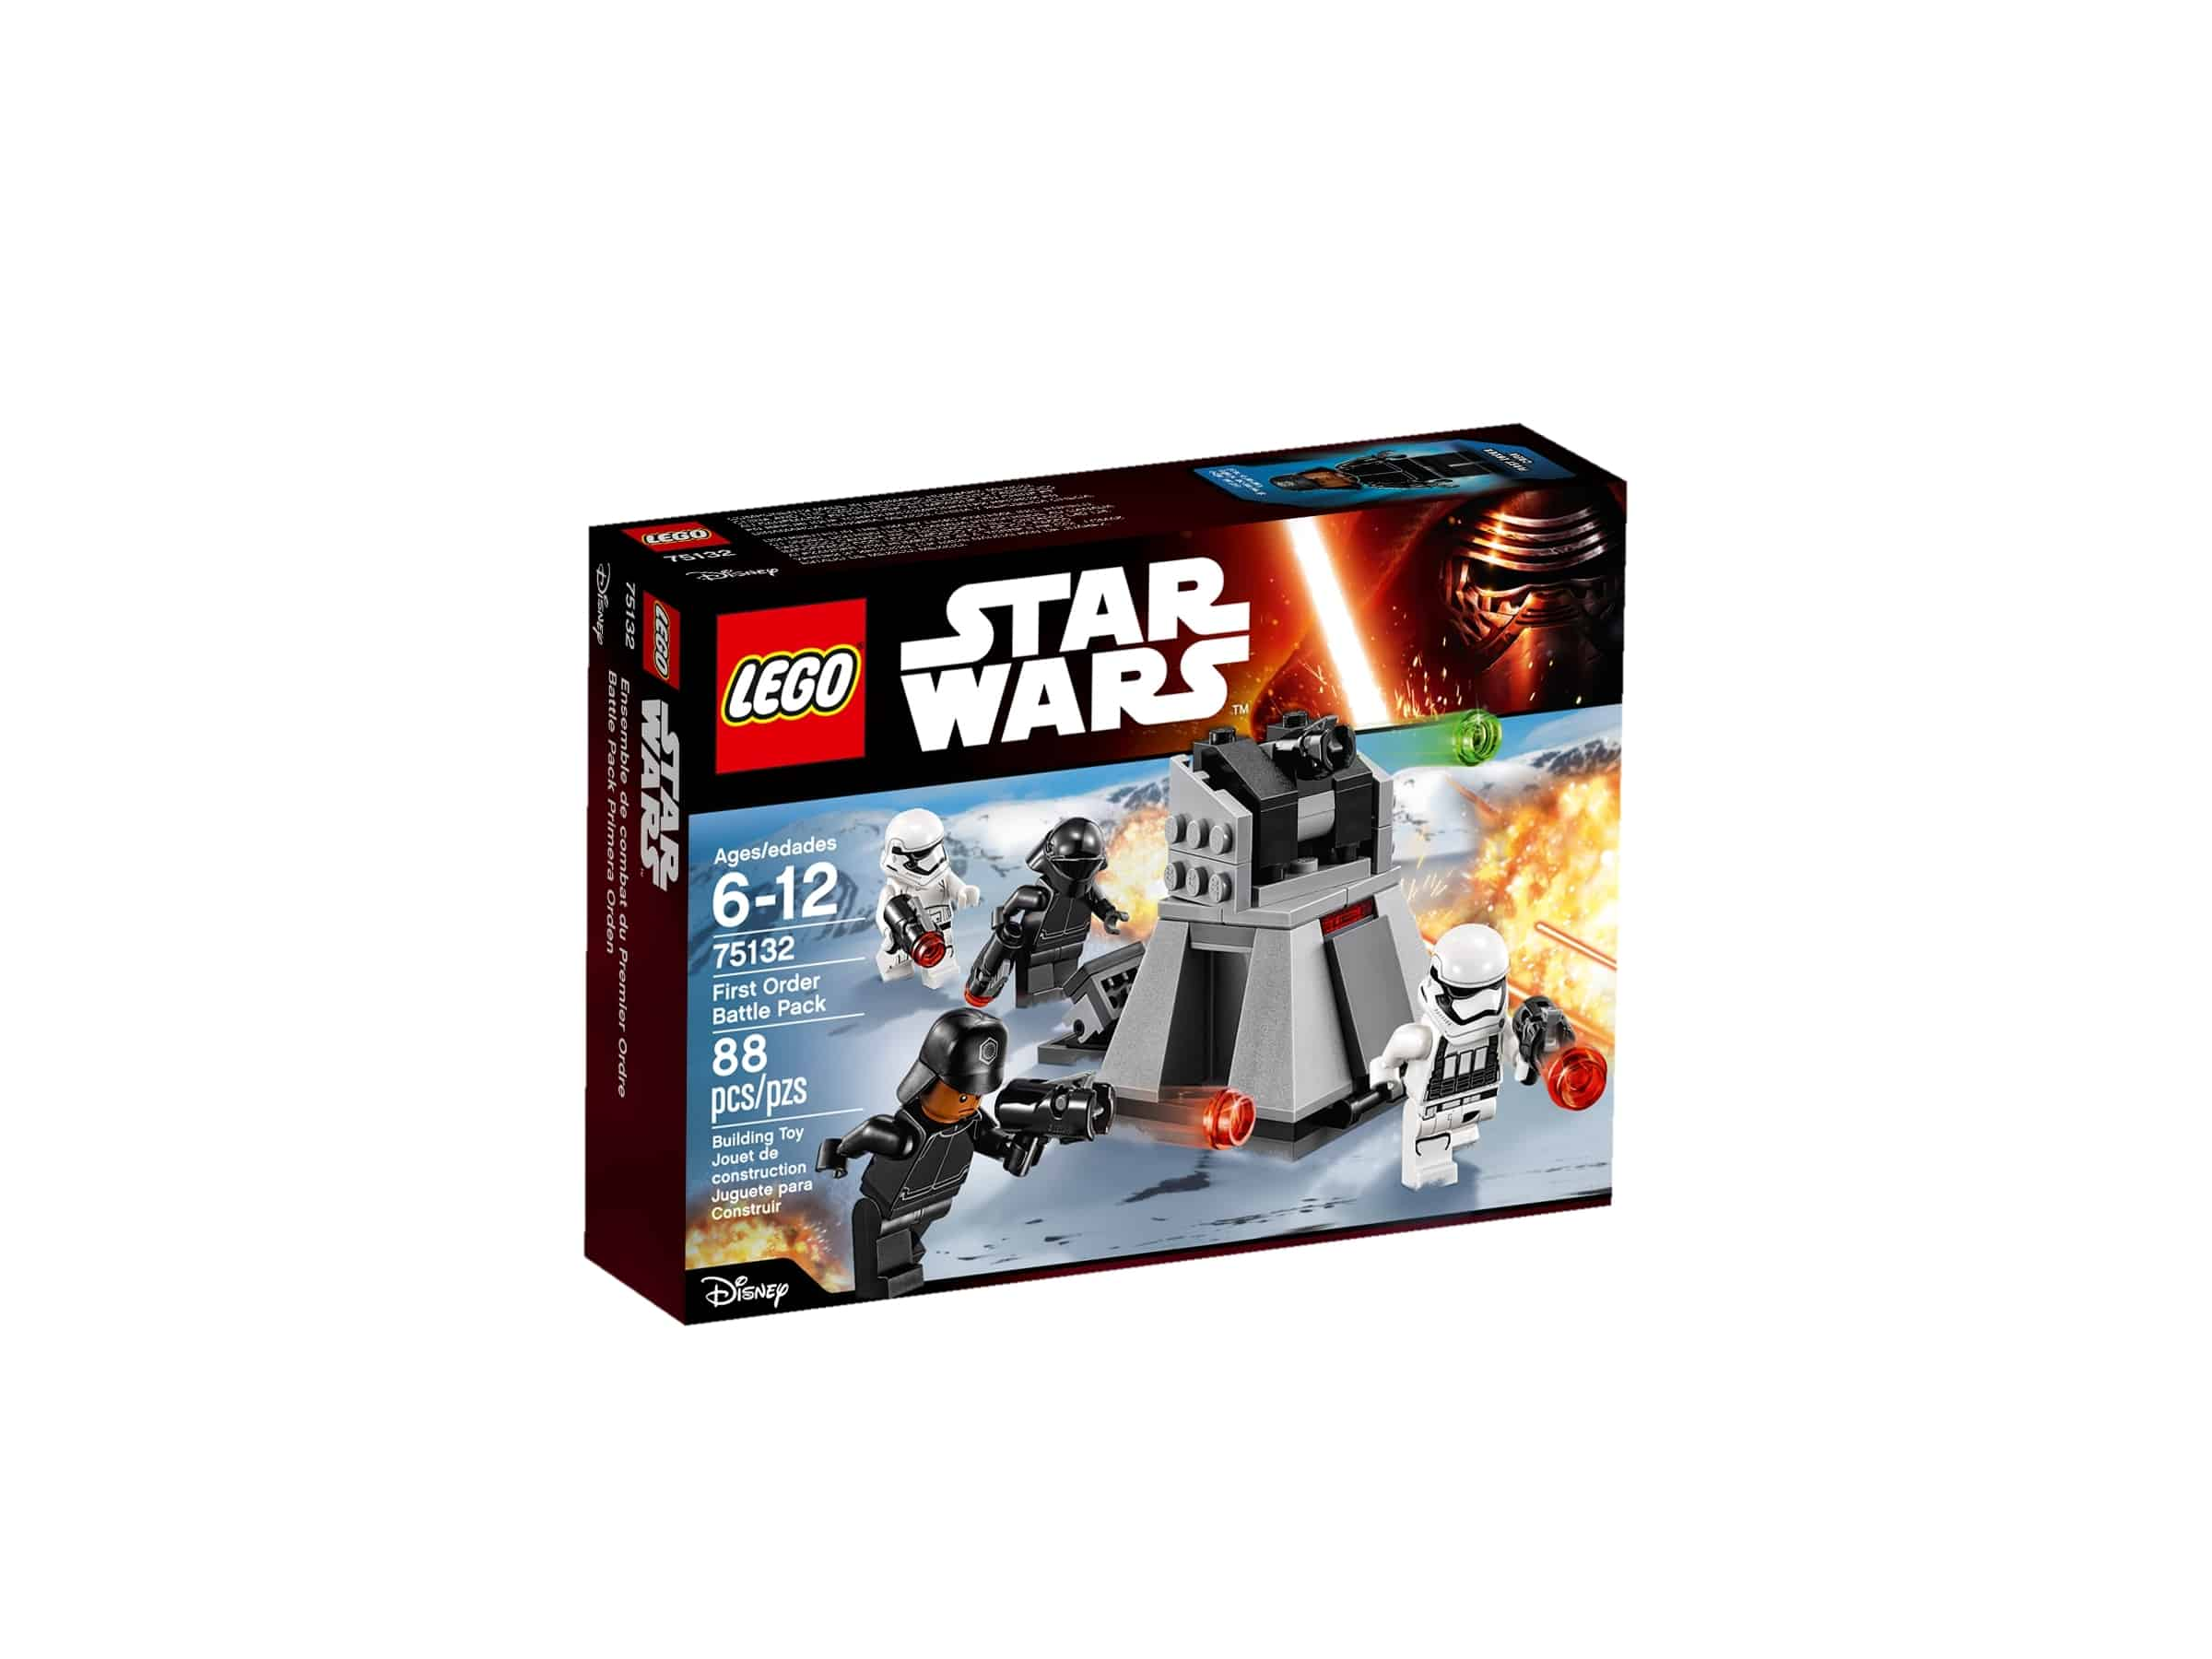 lego 75132 first order battle pack